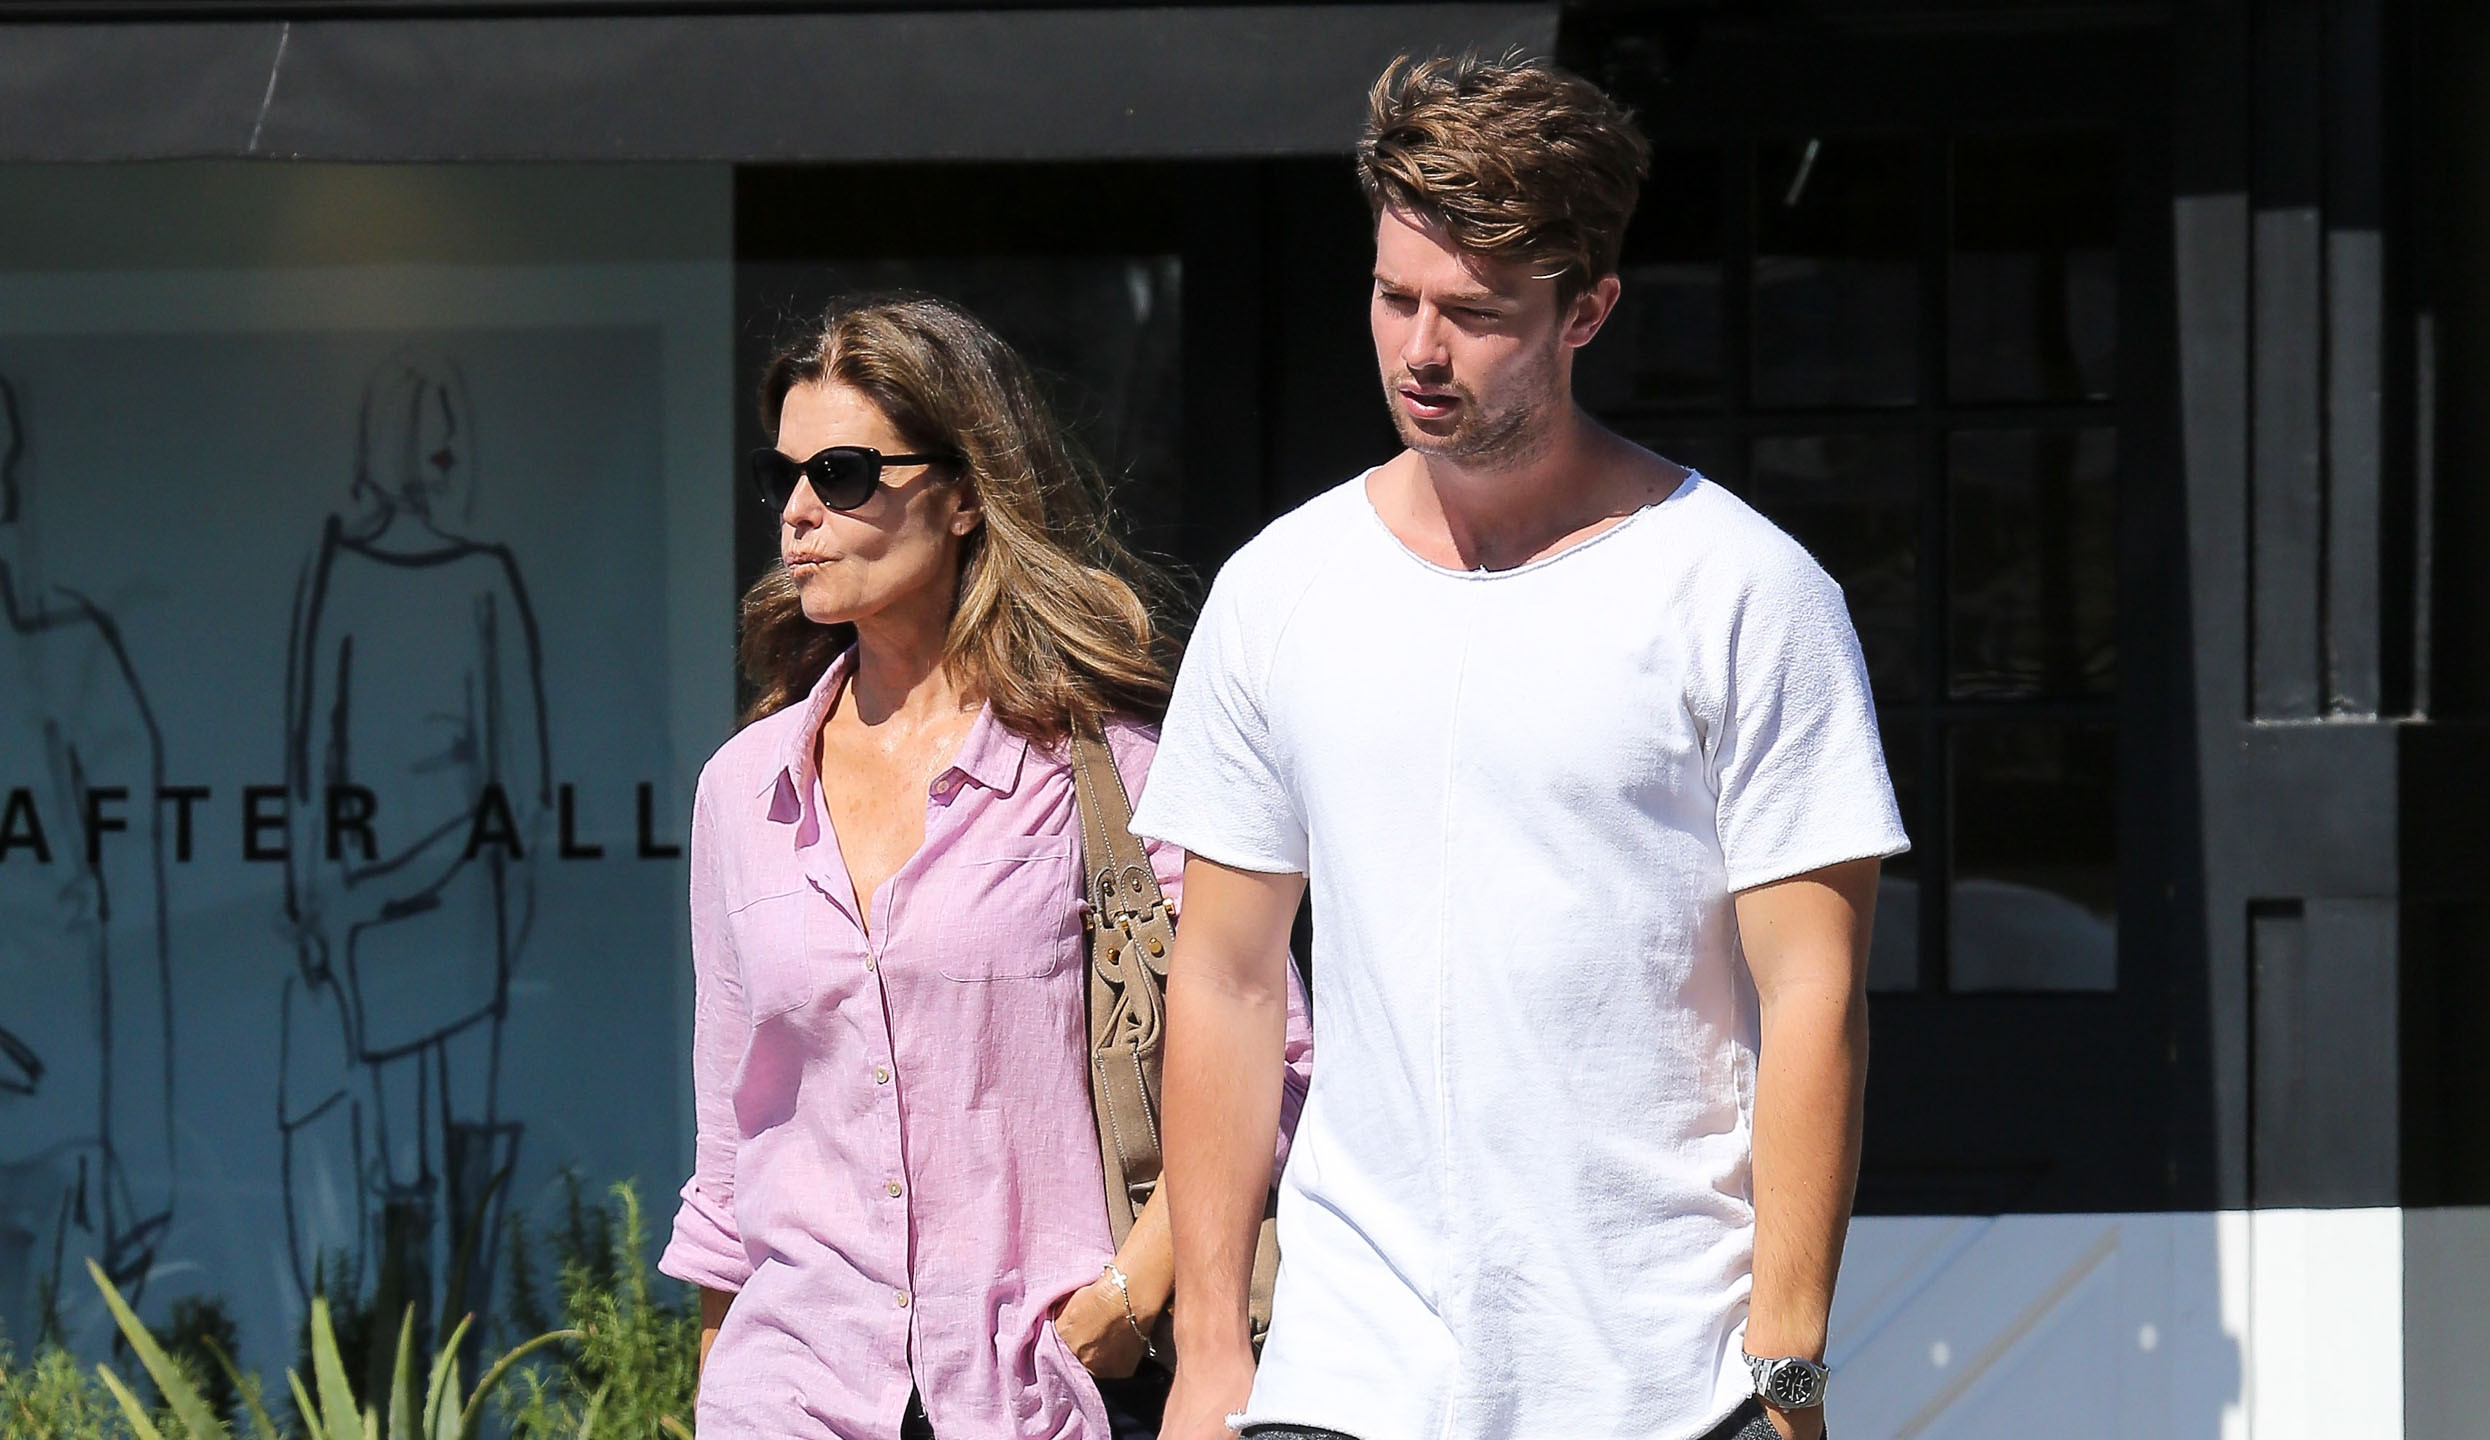 när fyller miley cyrus år Miley Cyrus dejtar Schwarzeneggers son – nu rasar mamman: